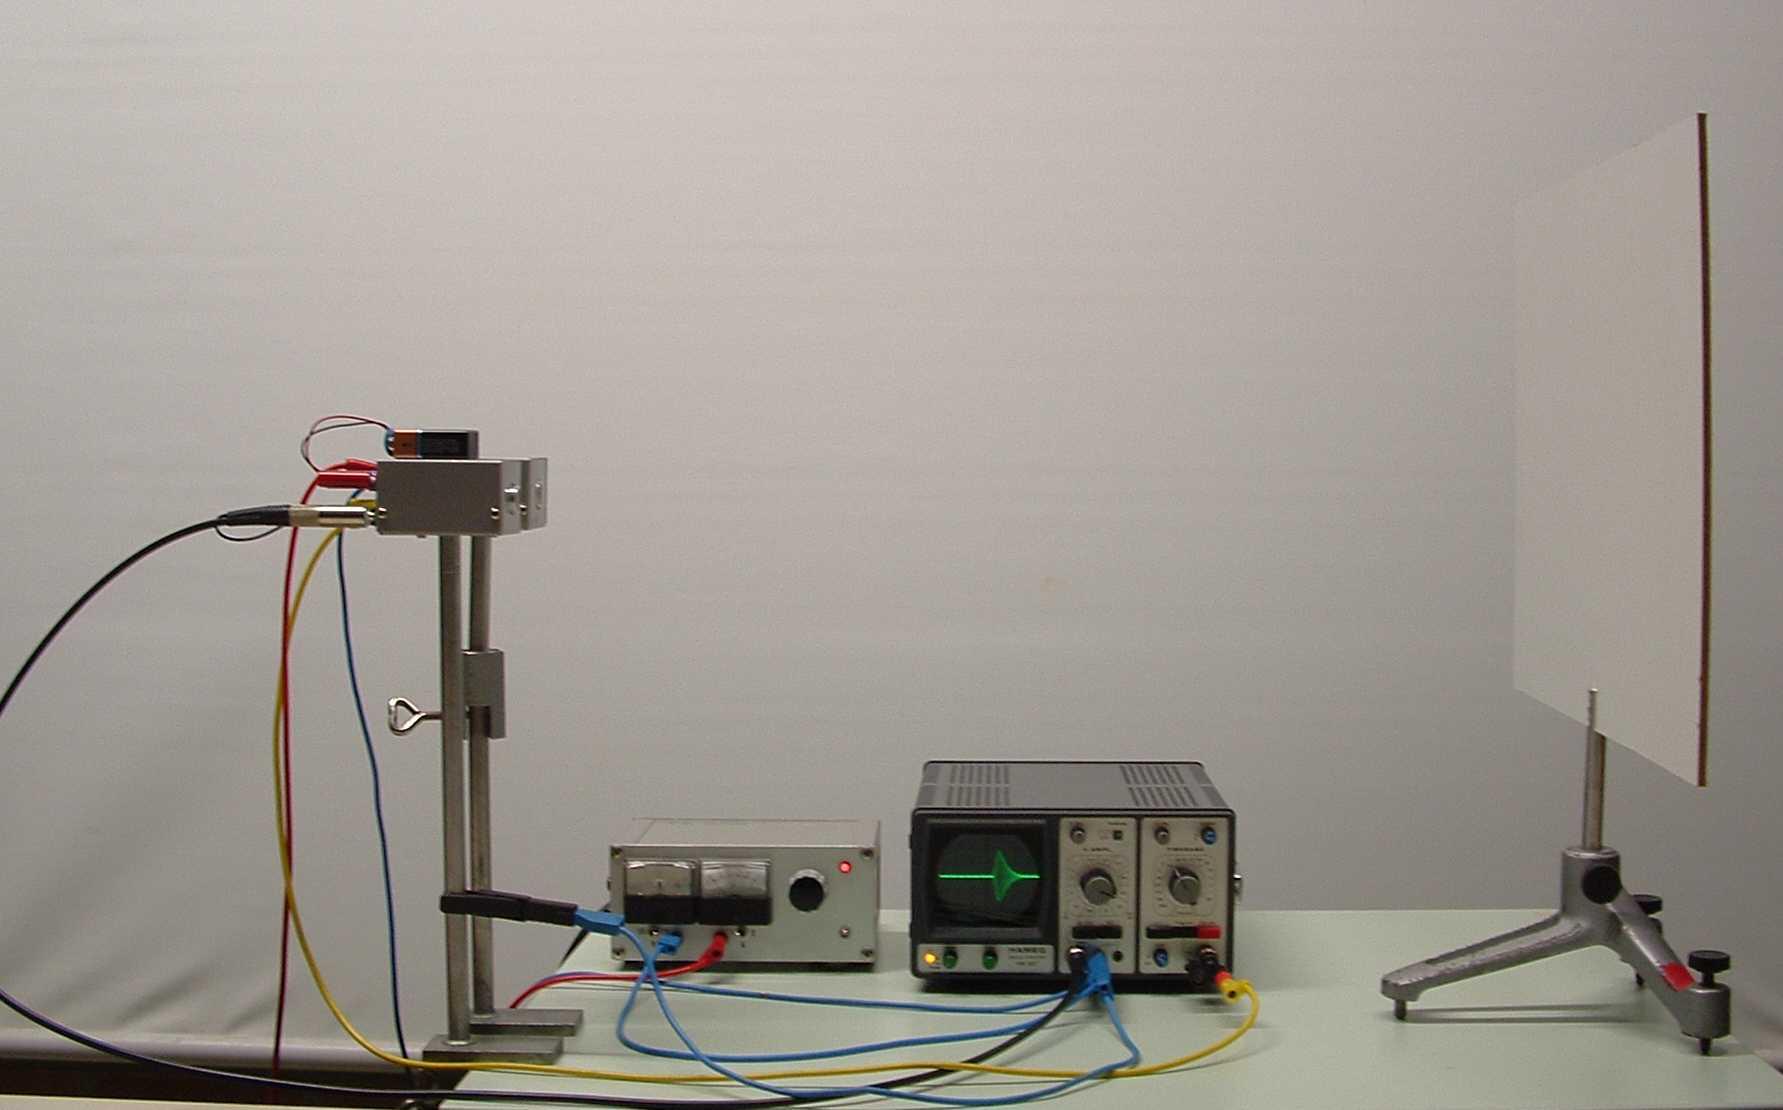 Entfernungsmessung Mit Ultraschall : Galerie : 8. mechanische wellen